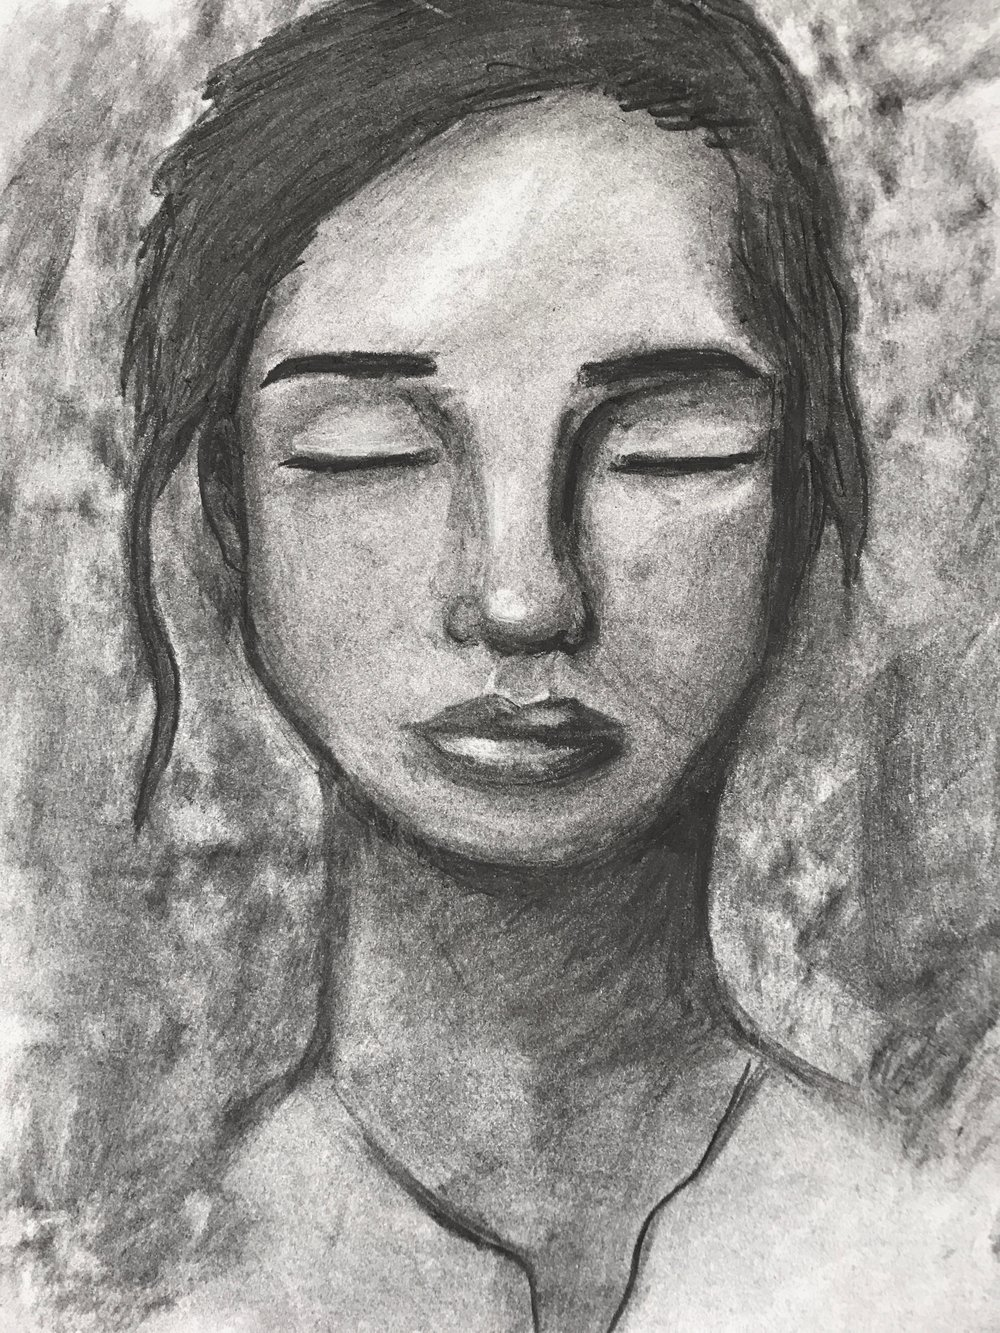 Elyse, age 13